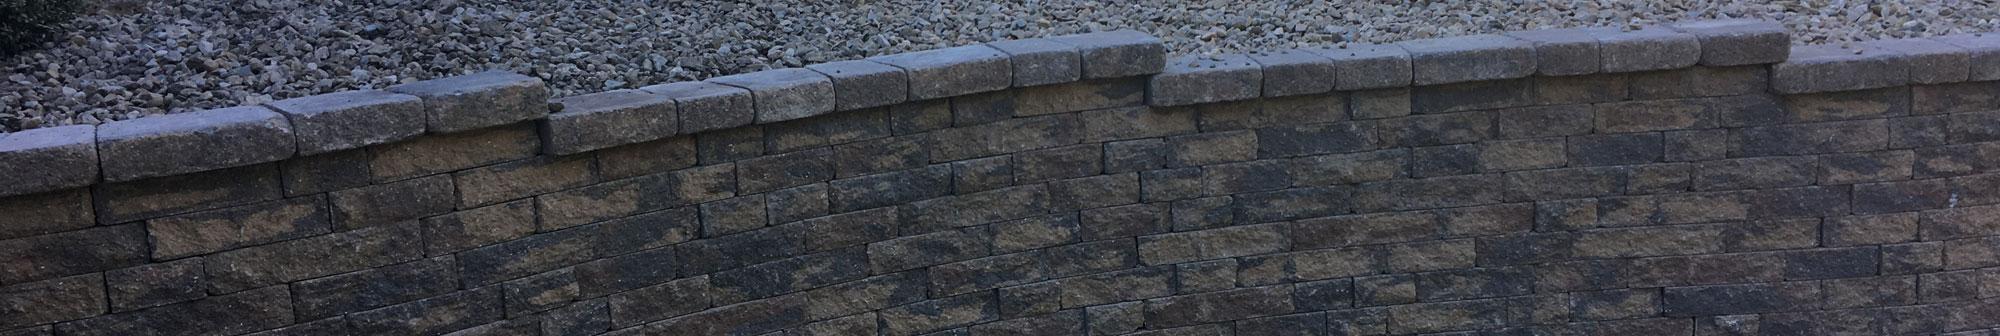 stonework-and-walls